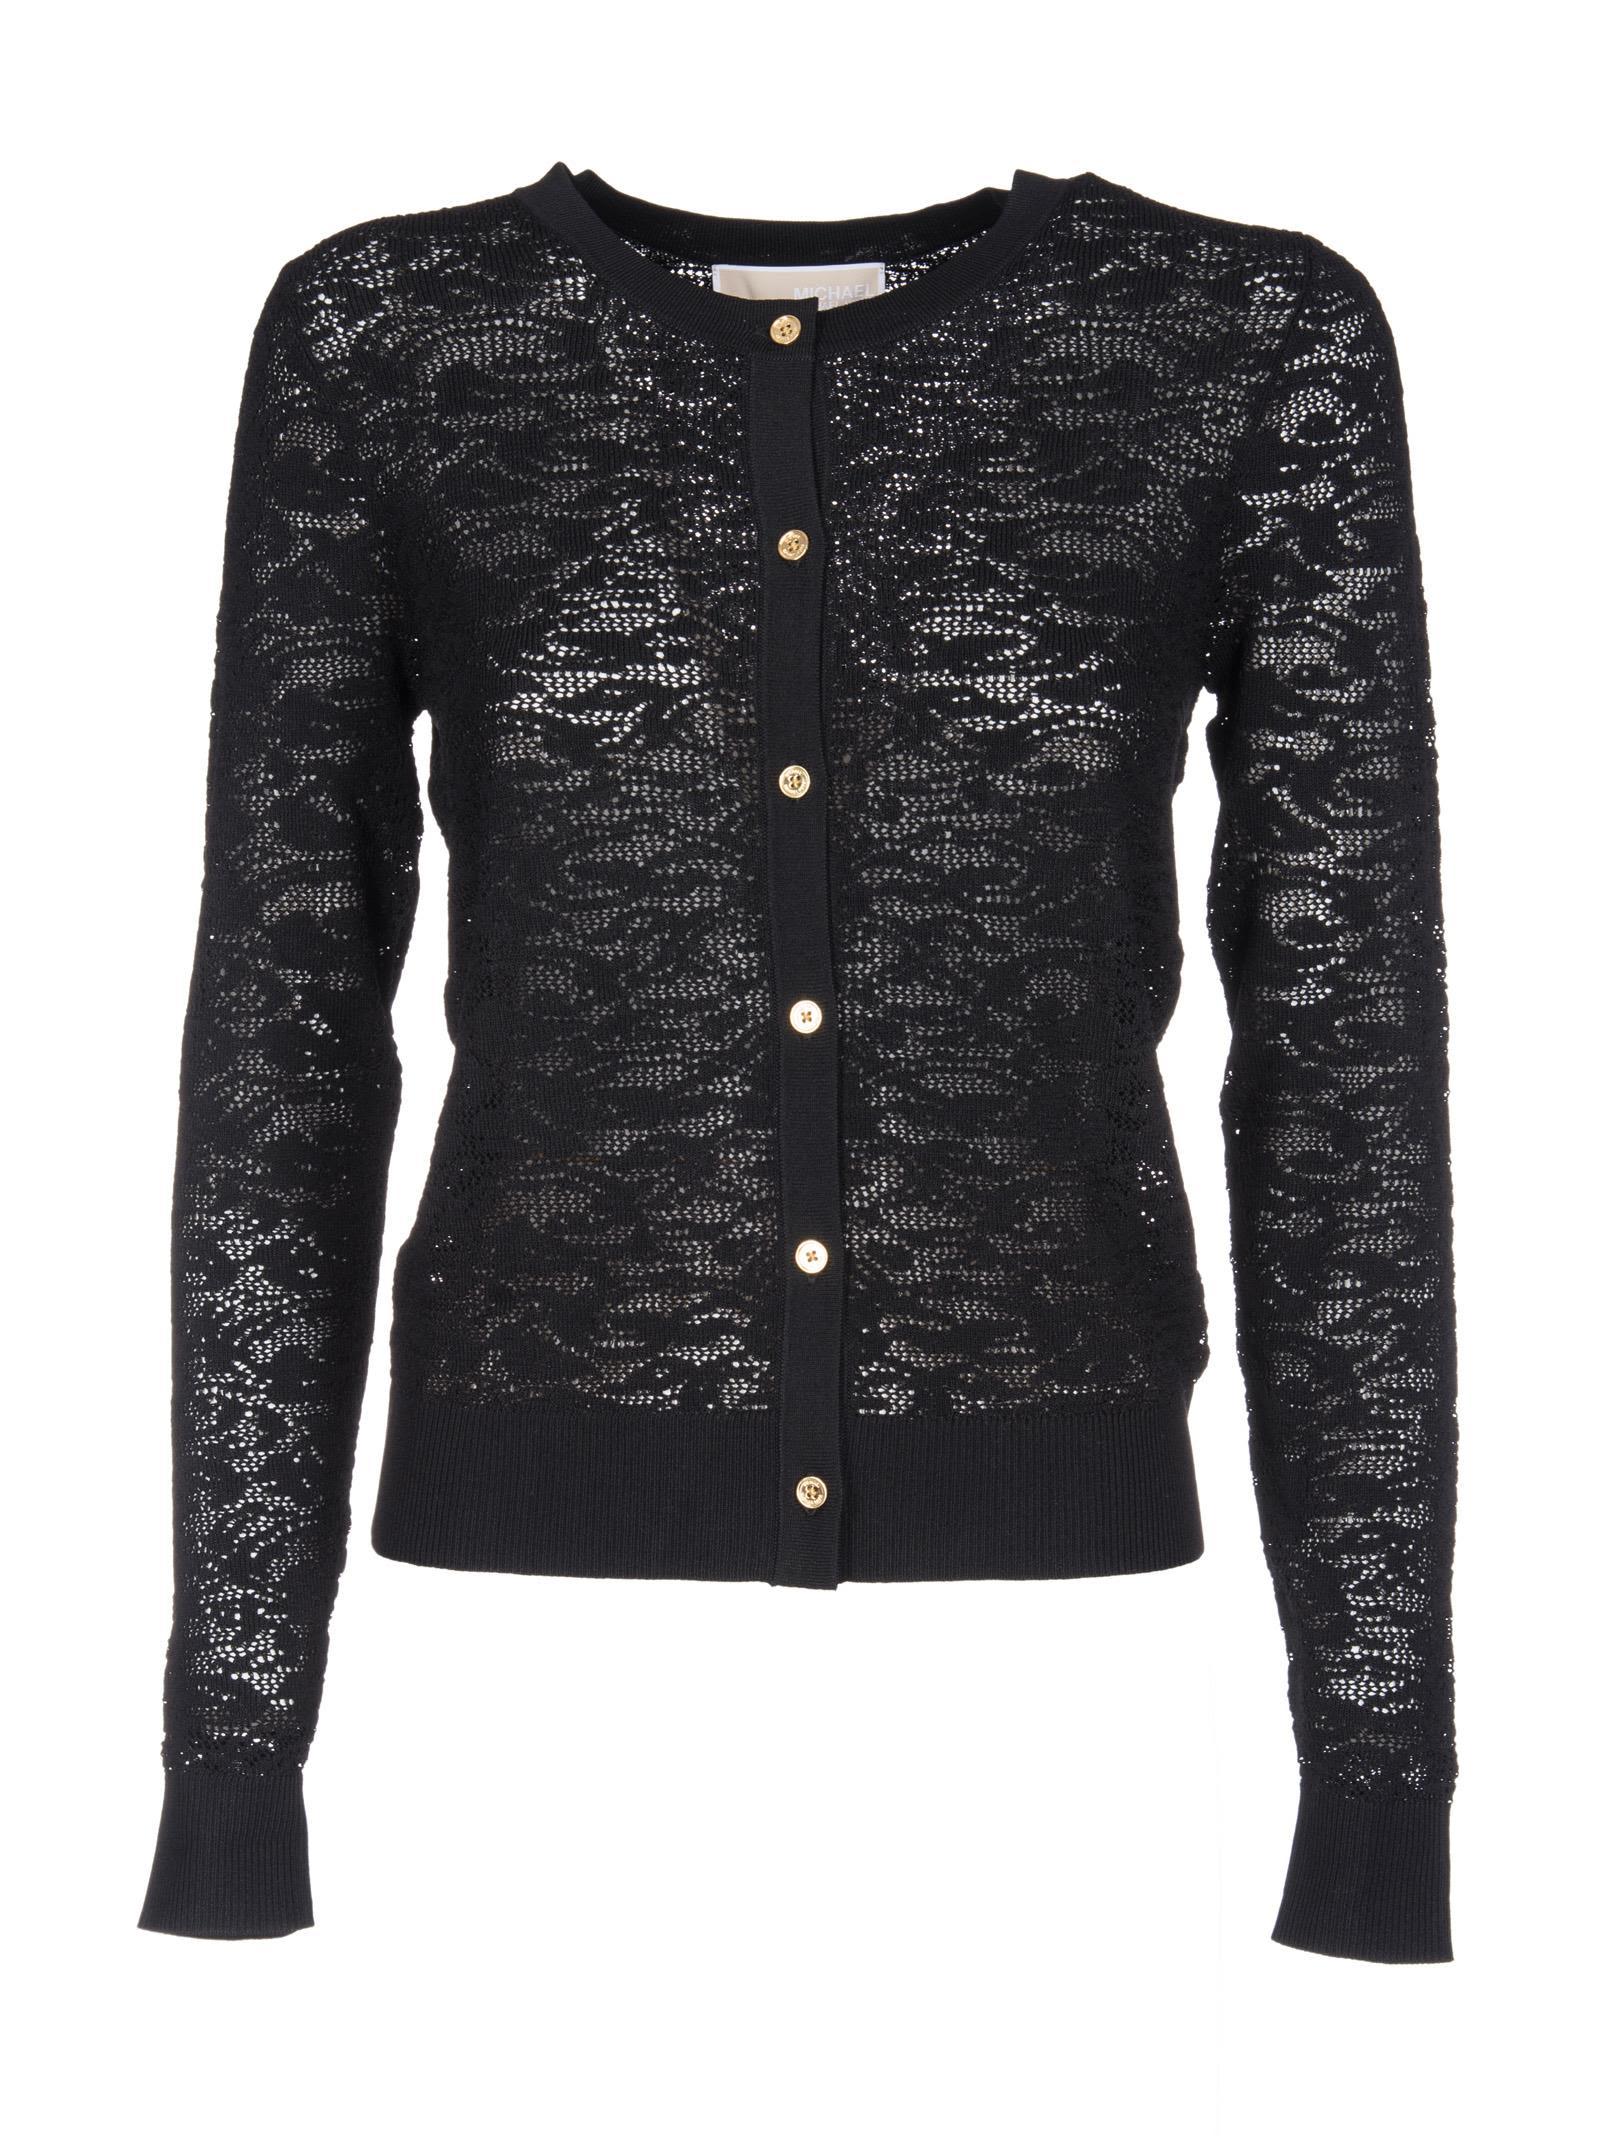 Michael Kors Lace Knit Cardigan